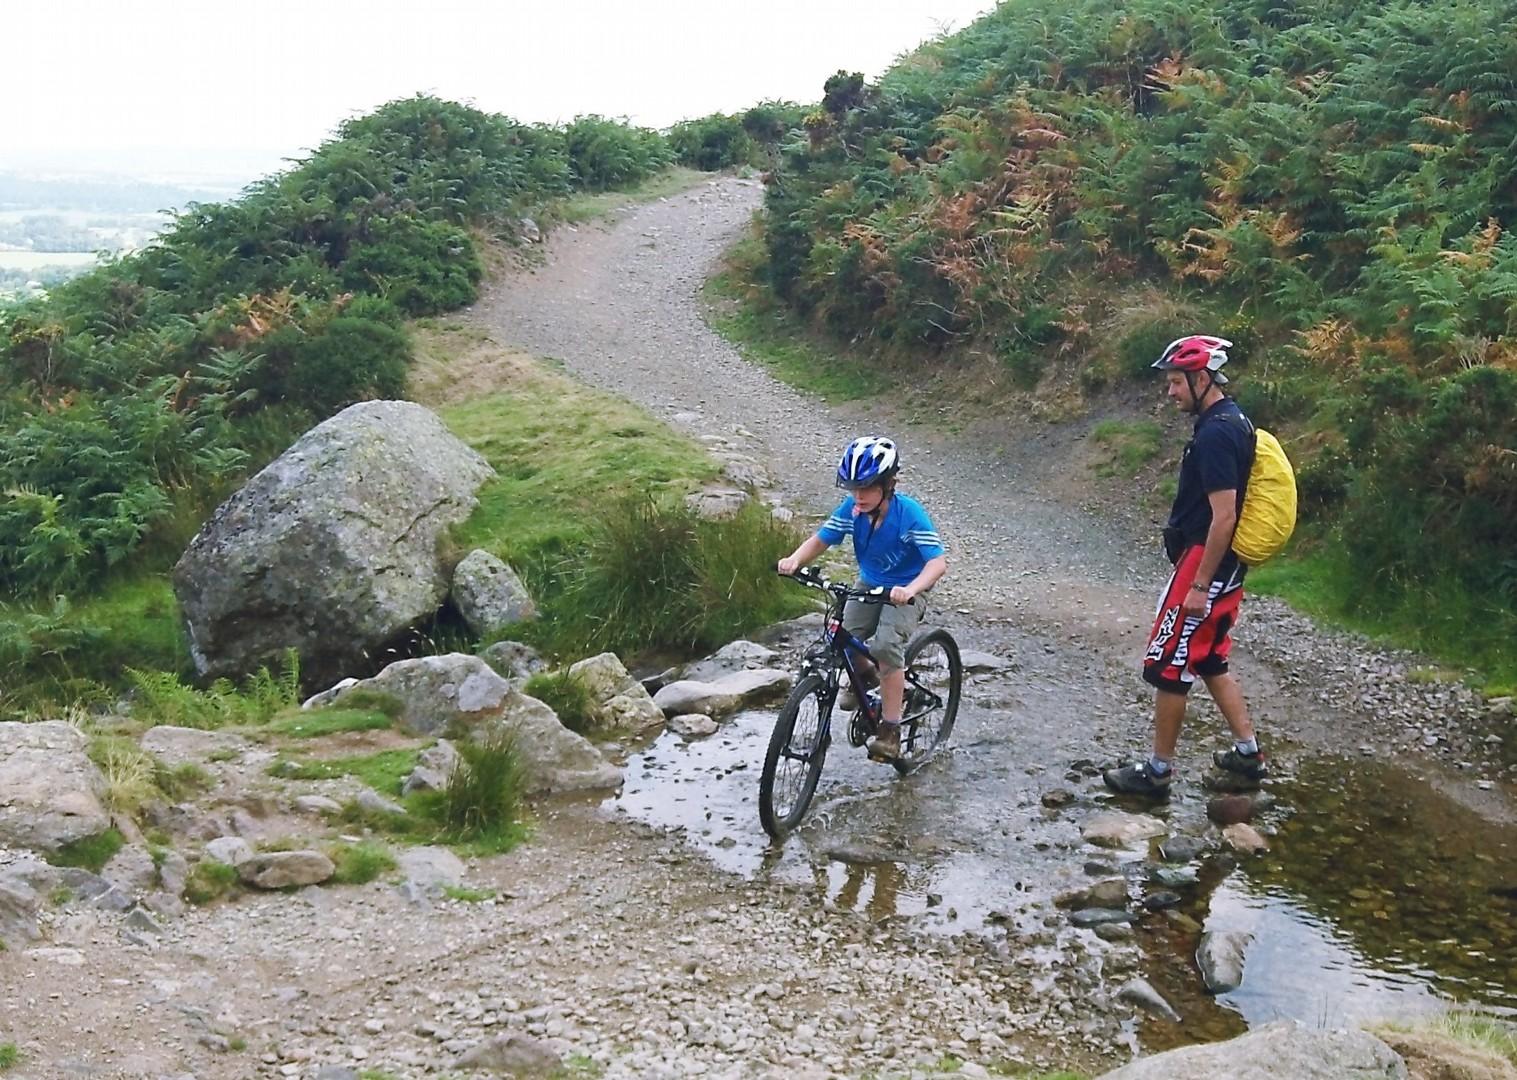 lake-district-uk-bike-skills.jpg - UK - Lake District - Bike Skills - Family Cycling